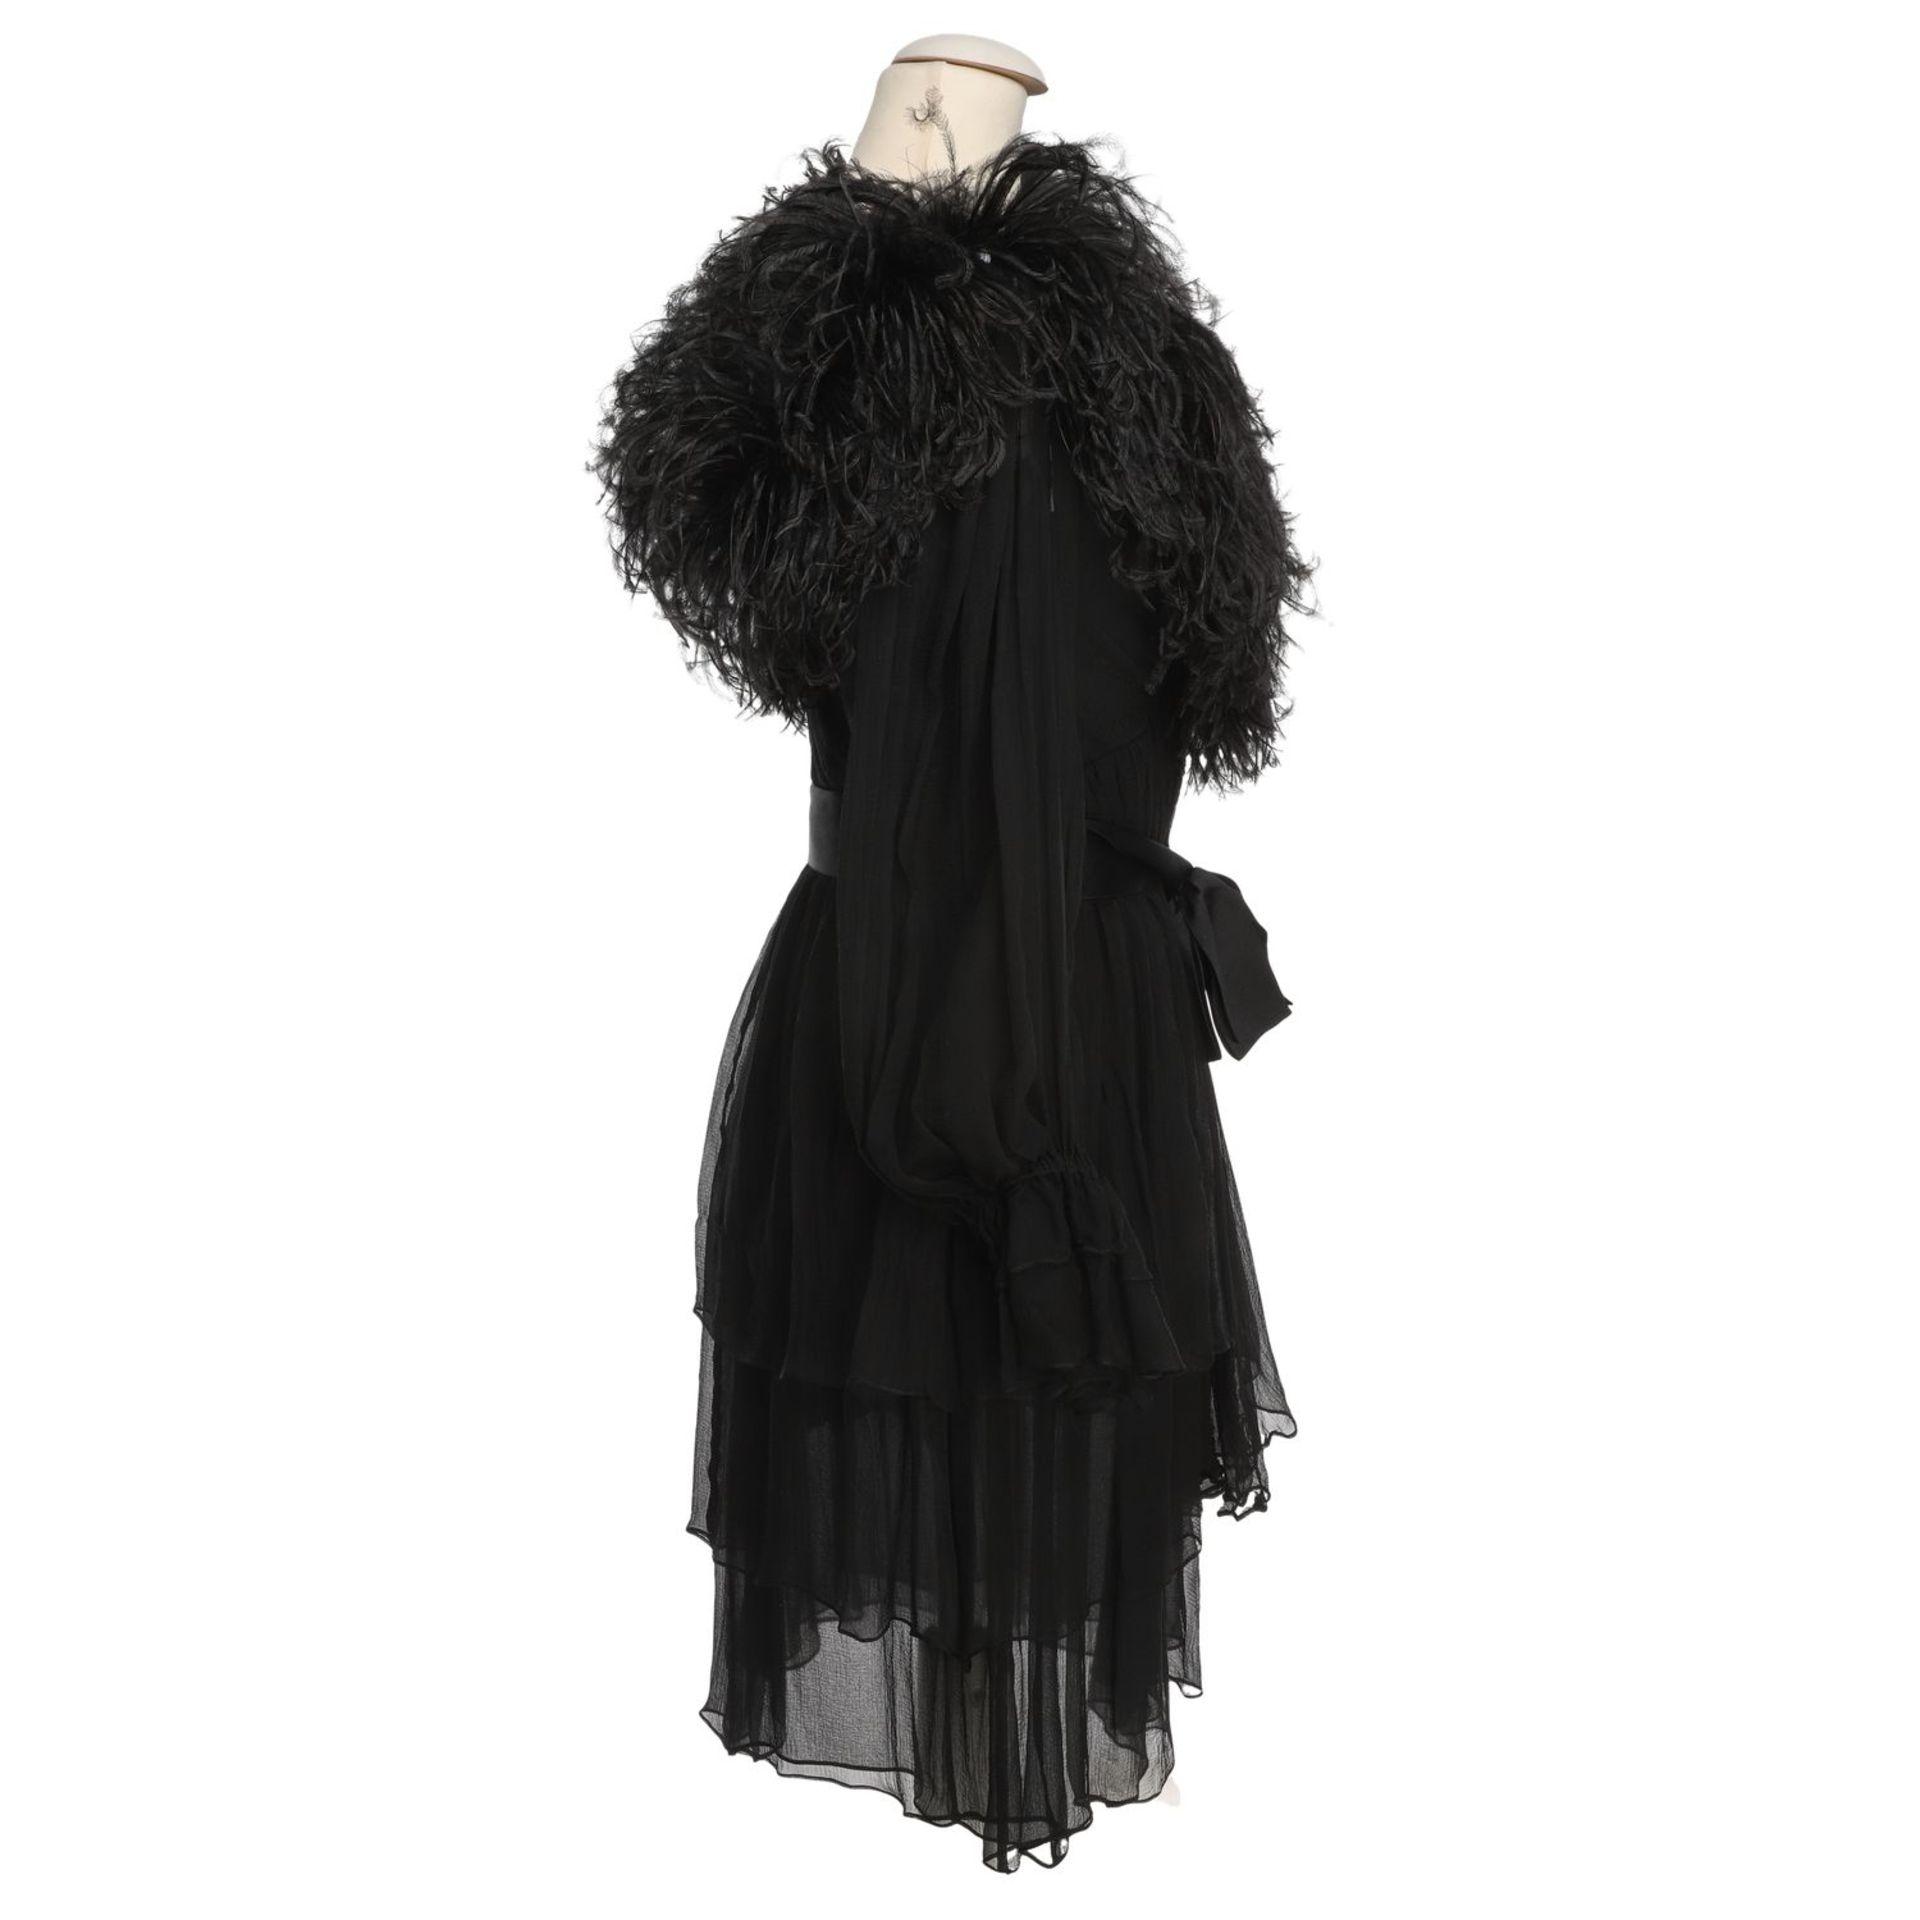 YVES SAINT LAURENT VINTAGE Kleid, Herstellergröße 36. - Image 3 of 4